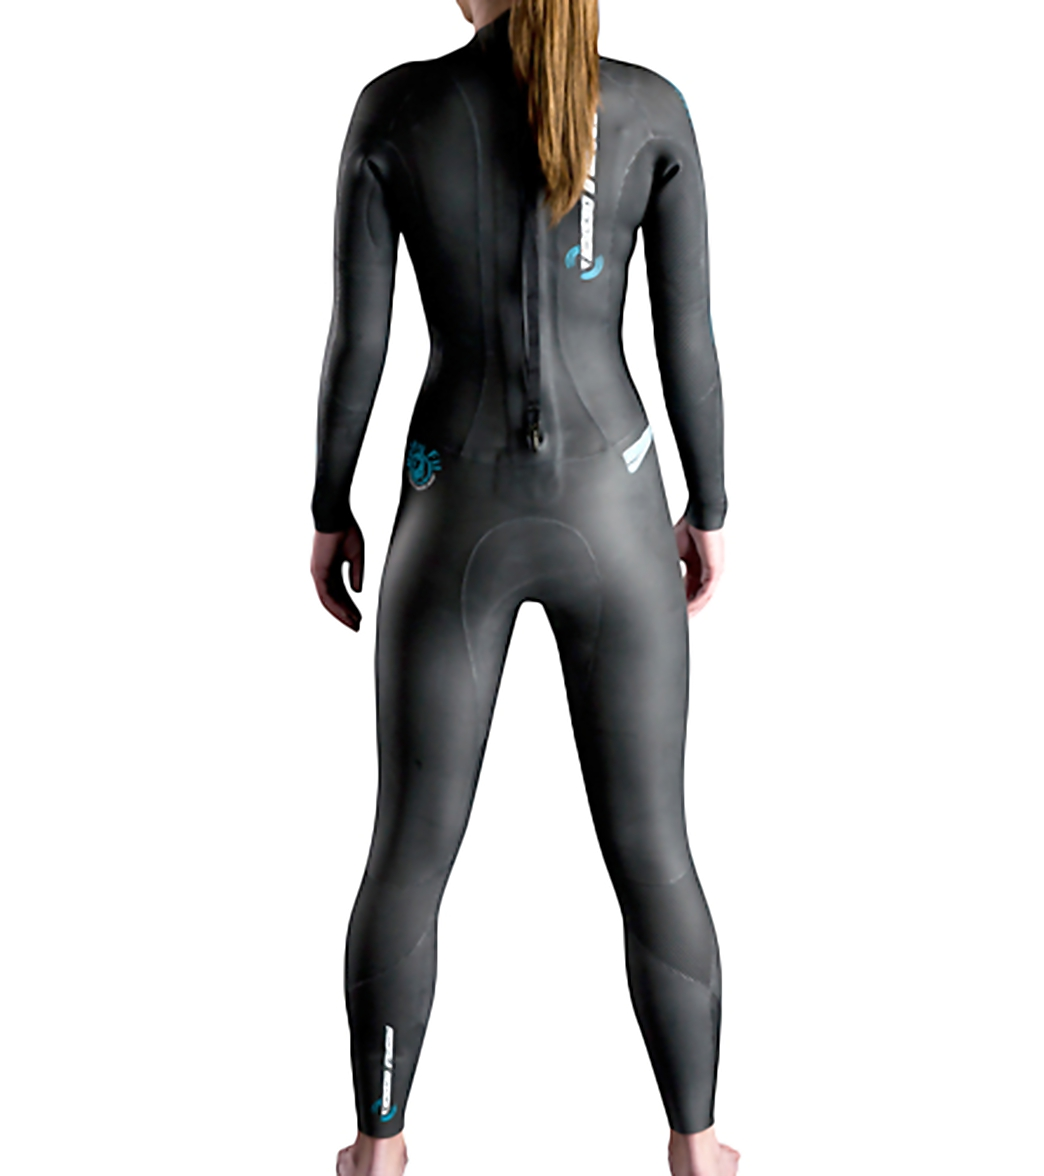 447390192d Profile Design Women s Marlin Fullsleeve Triathlon Wetsuit at ...